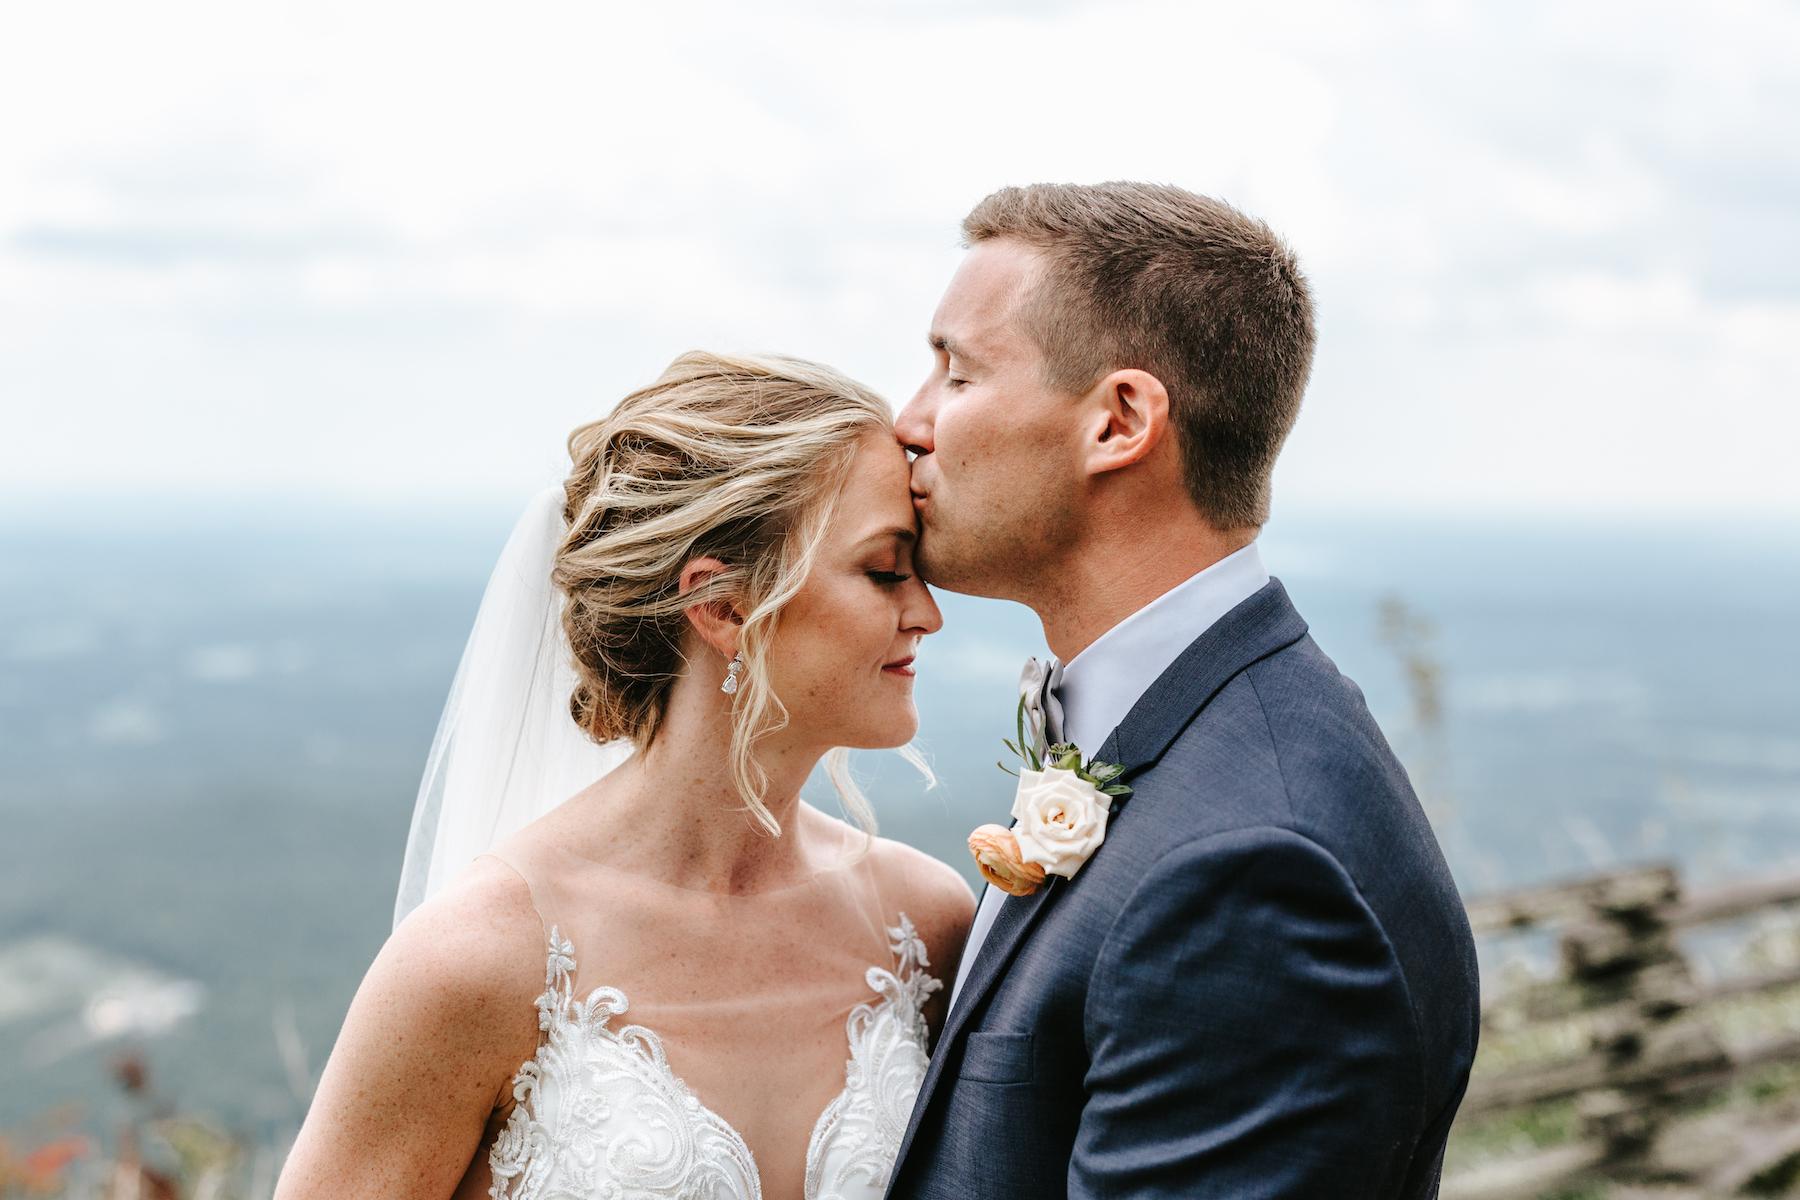 wedding-engagement-photographer-spartanburg-greenville-columbia-carolina-south-north-502.JPG